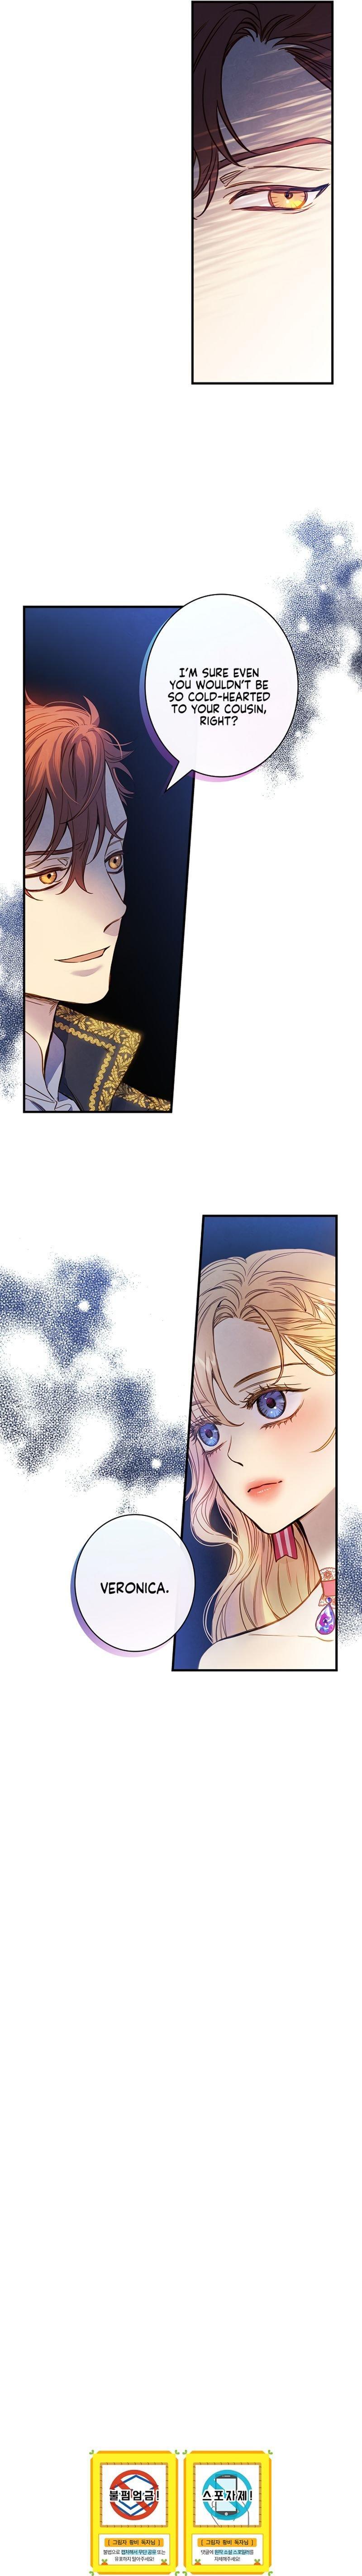 Shadow Queen Chapter 25 page 17 - Mangakakalots.com